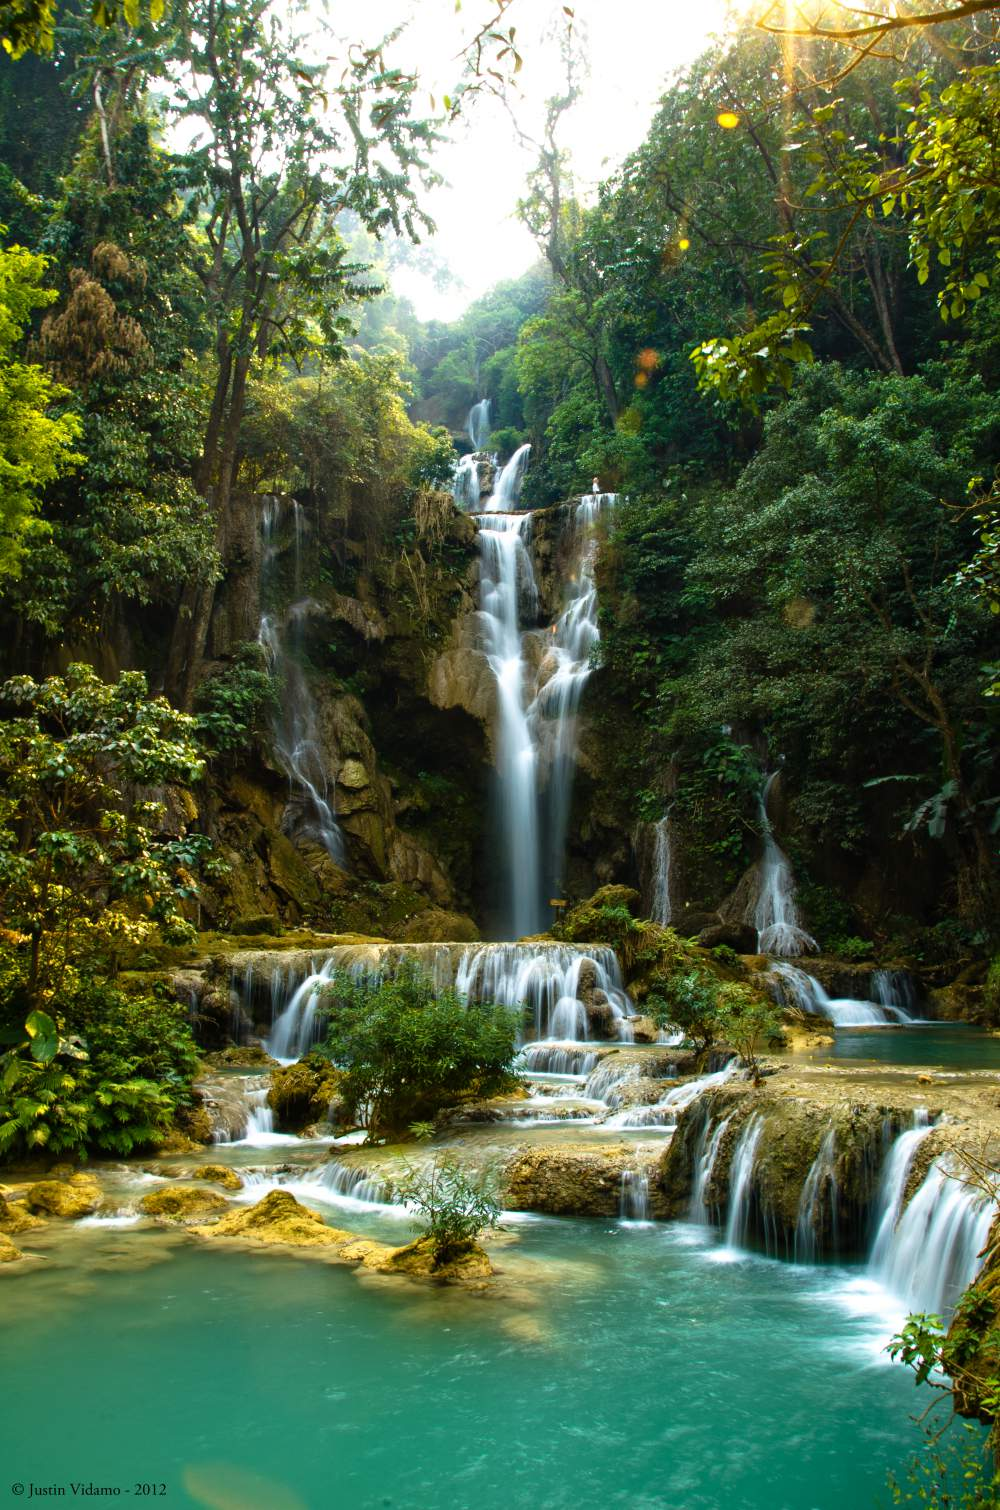 Kuang_Si_Falls,_Laos__1496917976_223.27.201.185